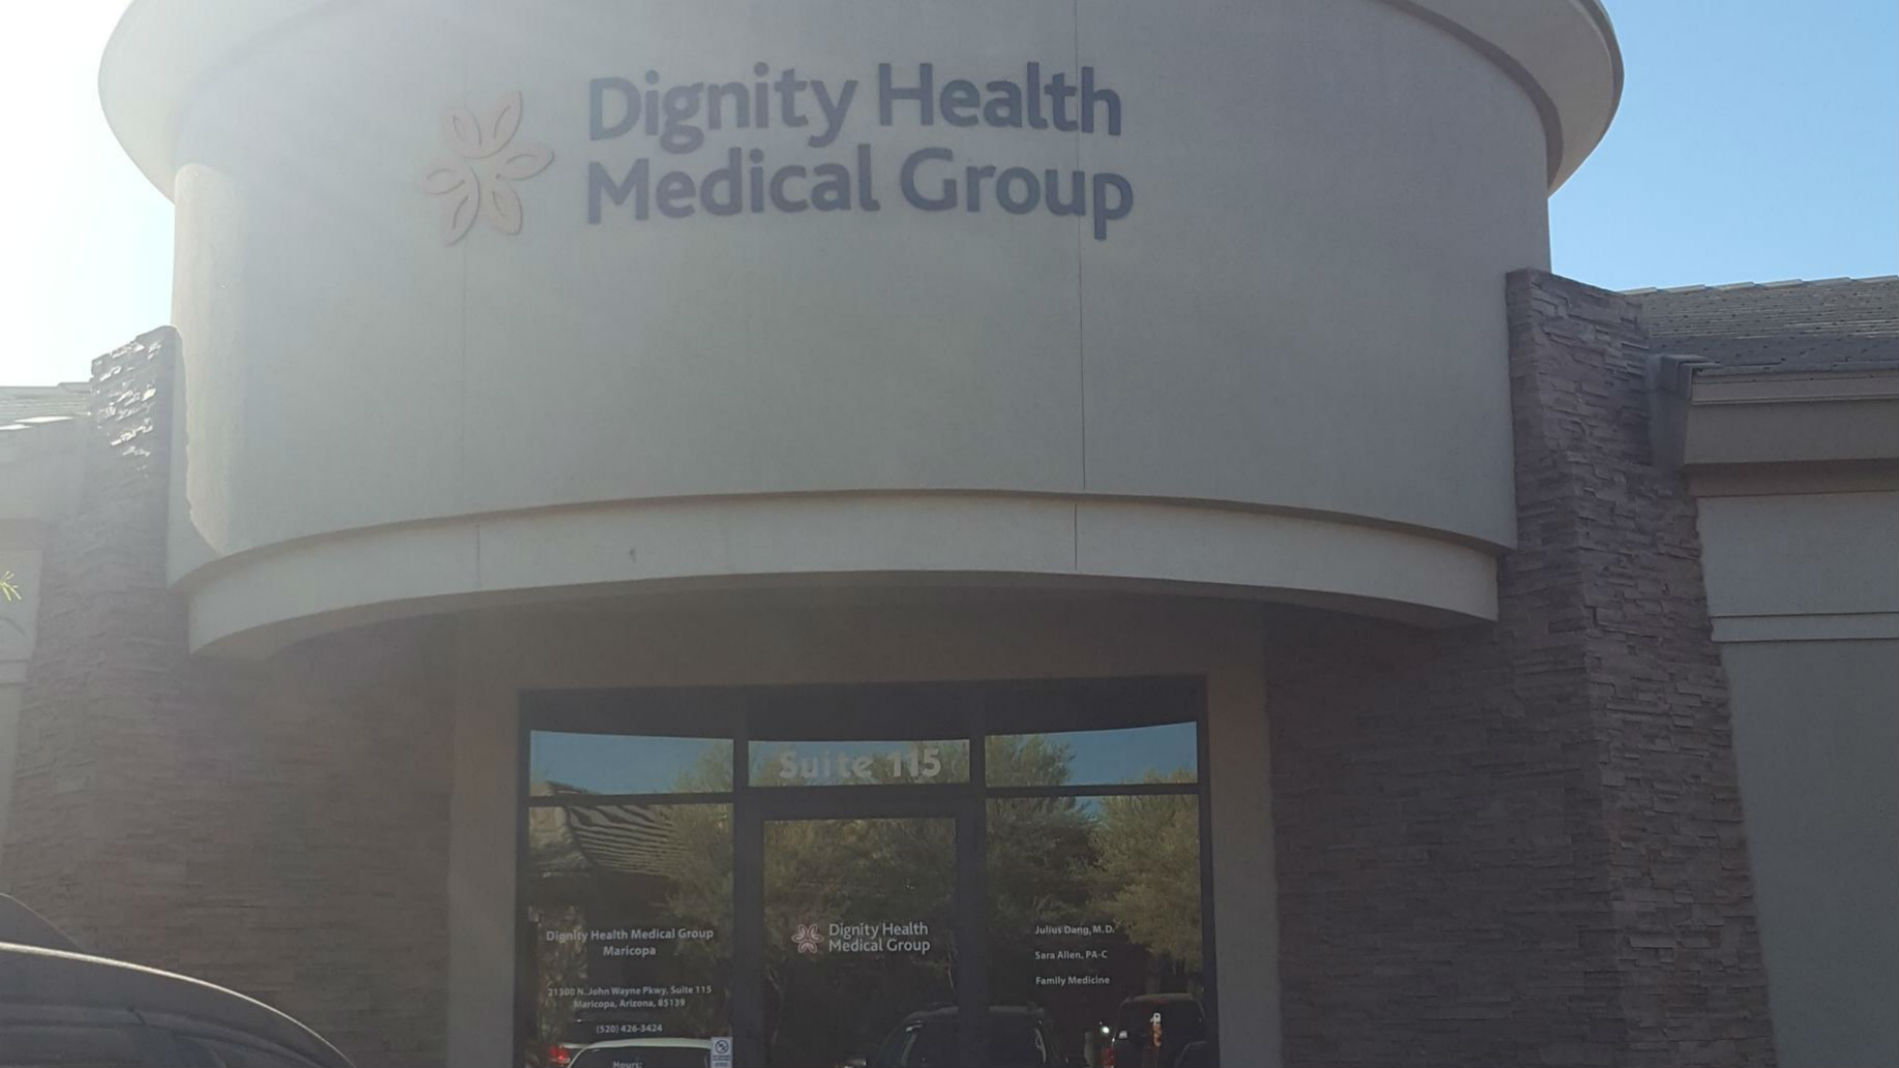 Dignity Health Medical Group Family Medicine - Maricopa image 0